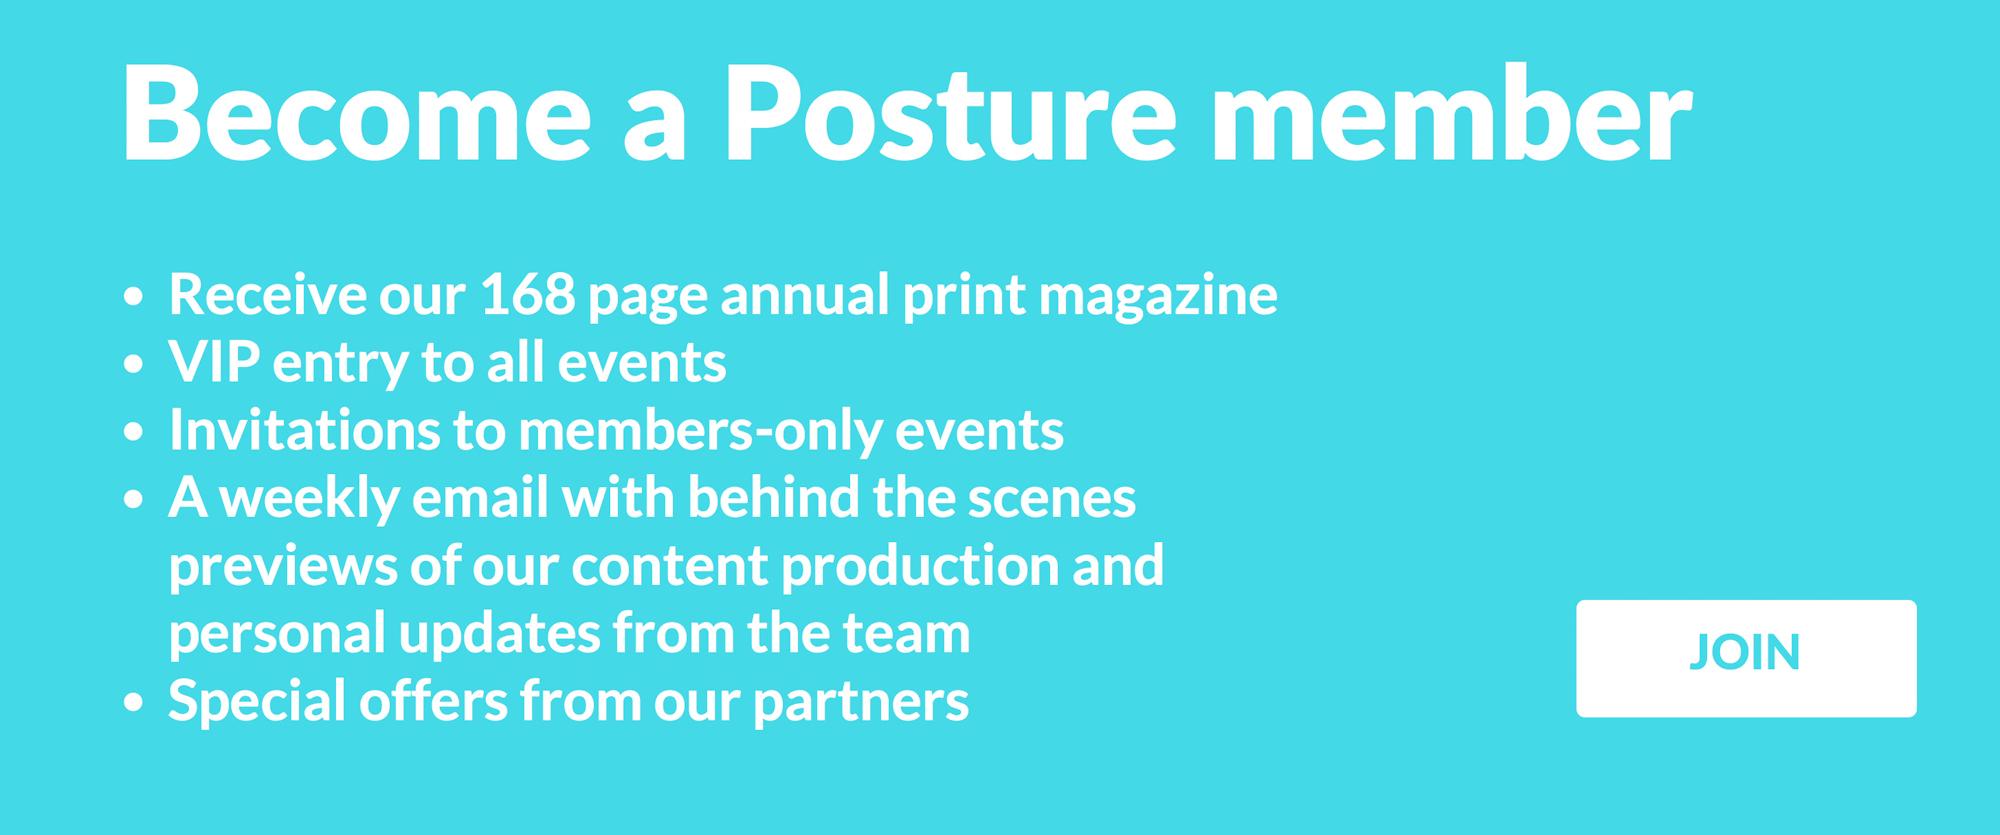 Posture Magazine champions underrepresented creators and entrepreneurs